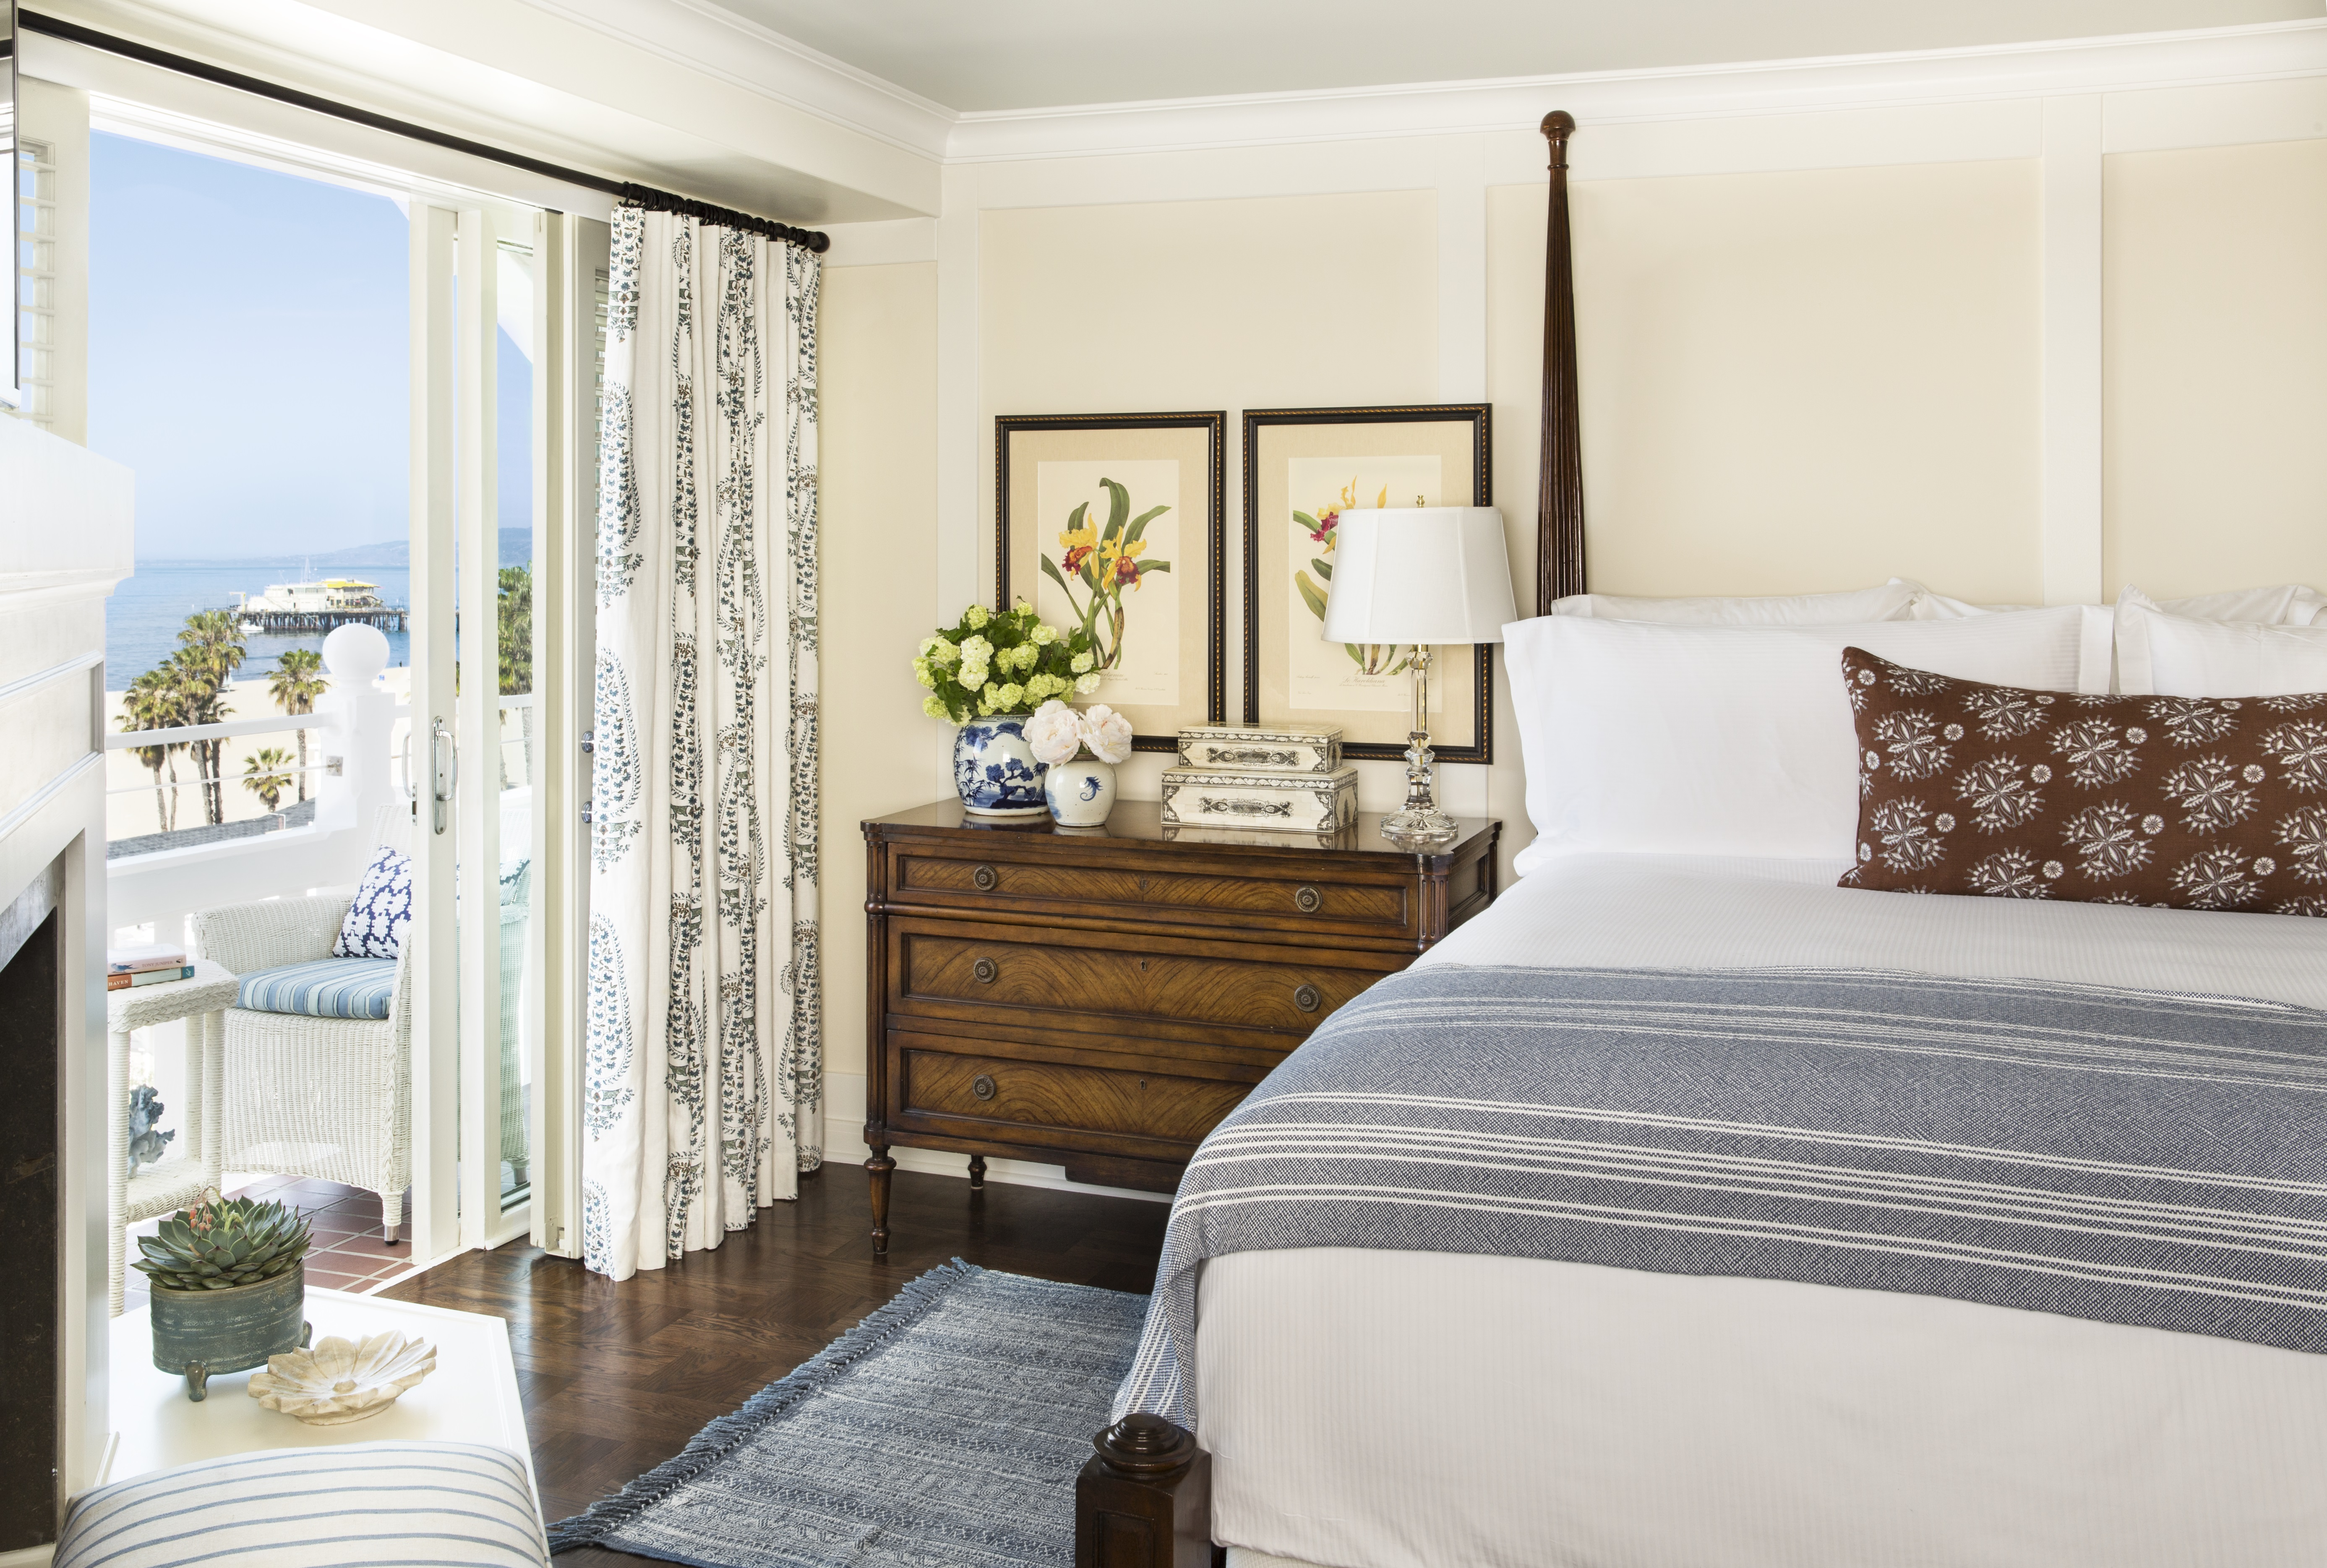 Santa Monica Restaurants - Luxury Hotel Beachfront Dining | Shutters ...